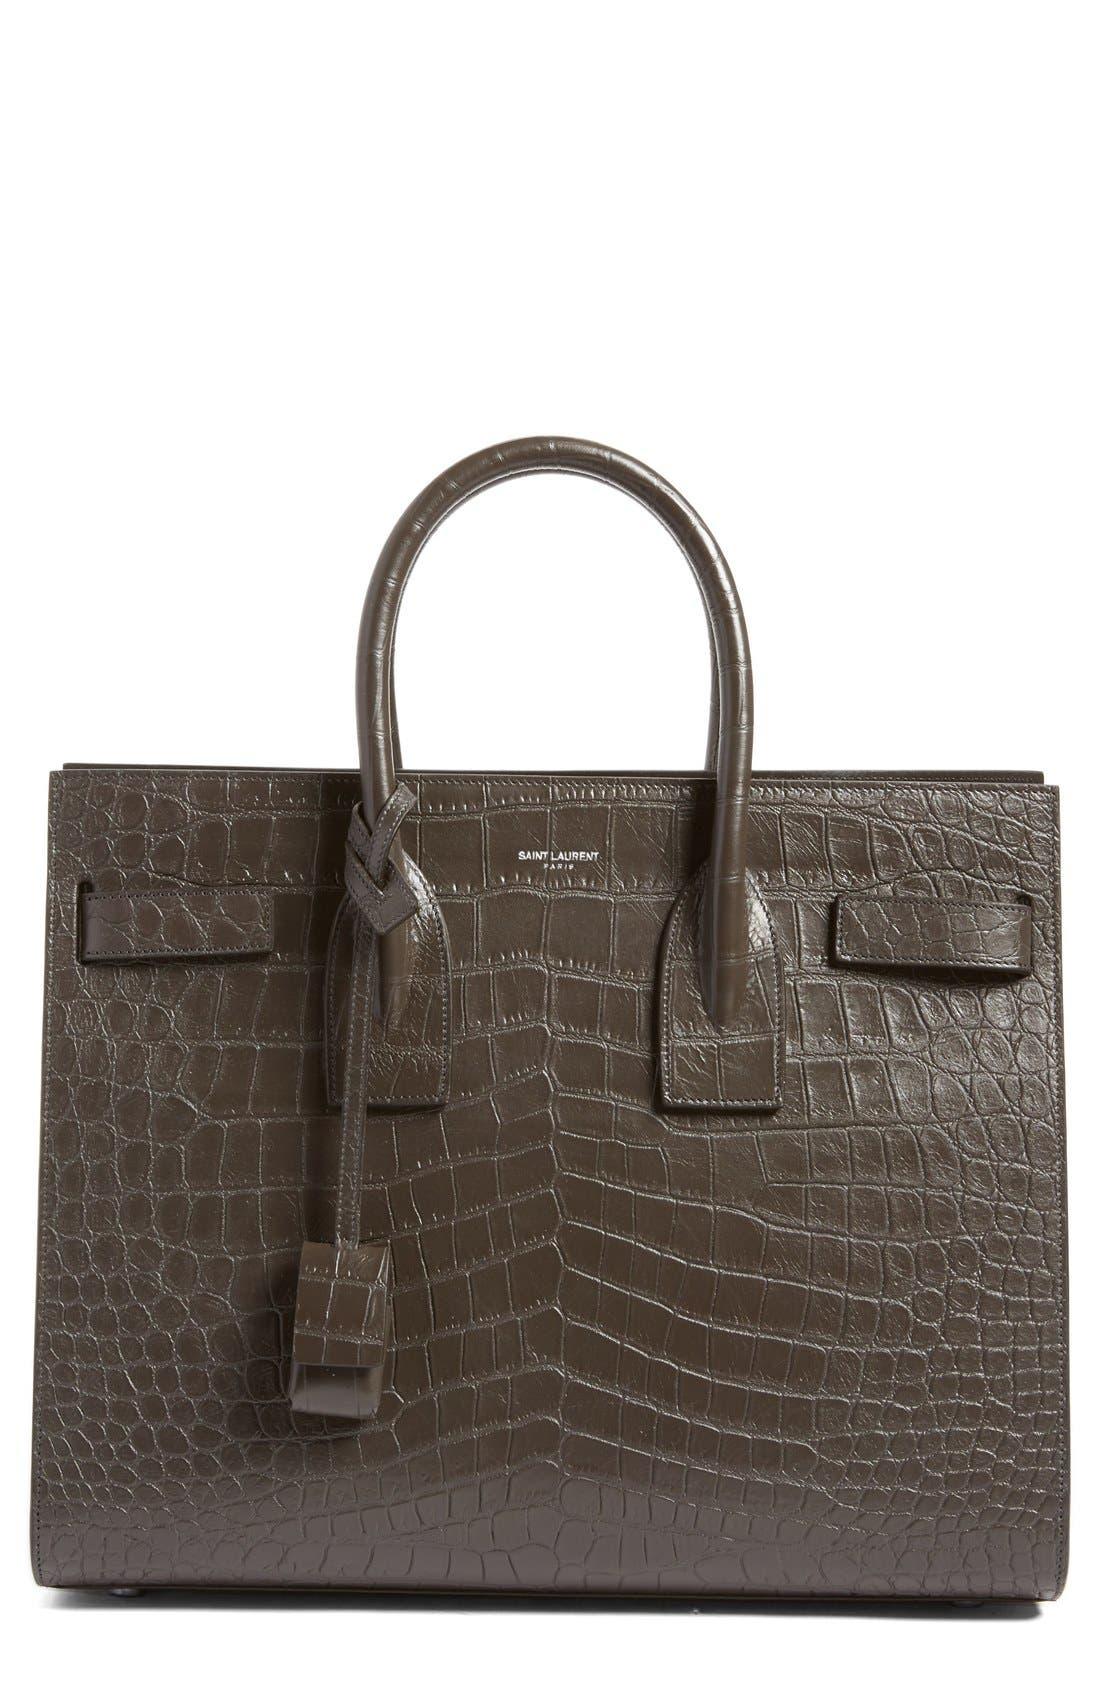 Main Image - Saint Laurent 'Small Sac de Jour' Croc Embossed Leather Tote